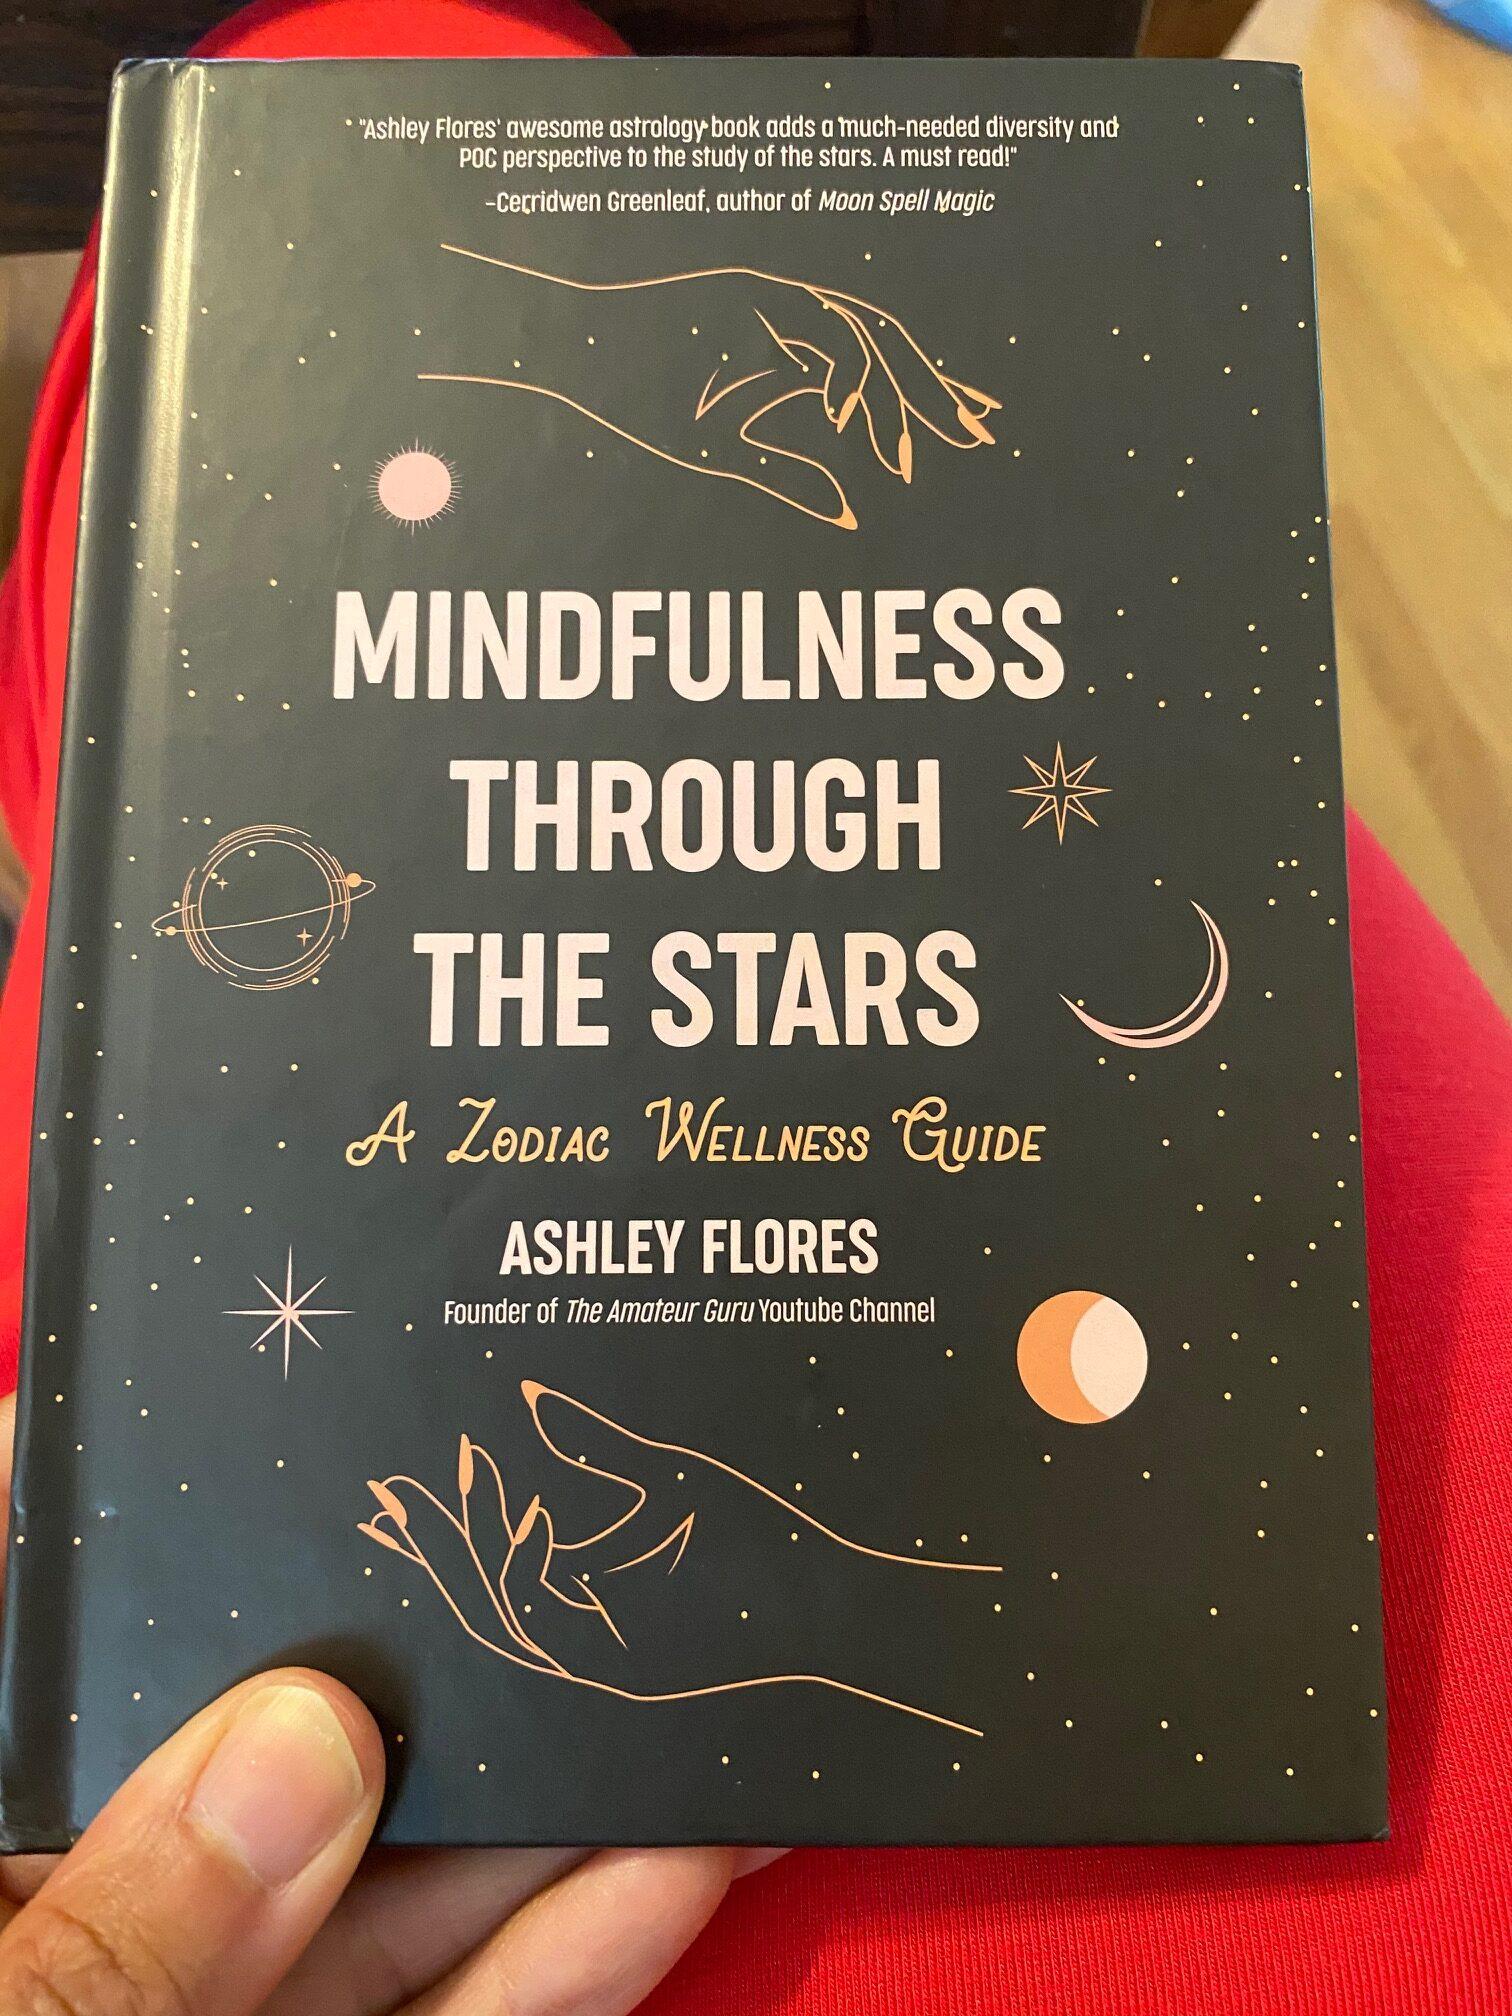 Mindfulness Through the Stars: A Zodiac Wellness Guide book